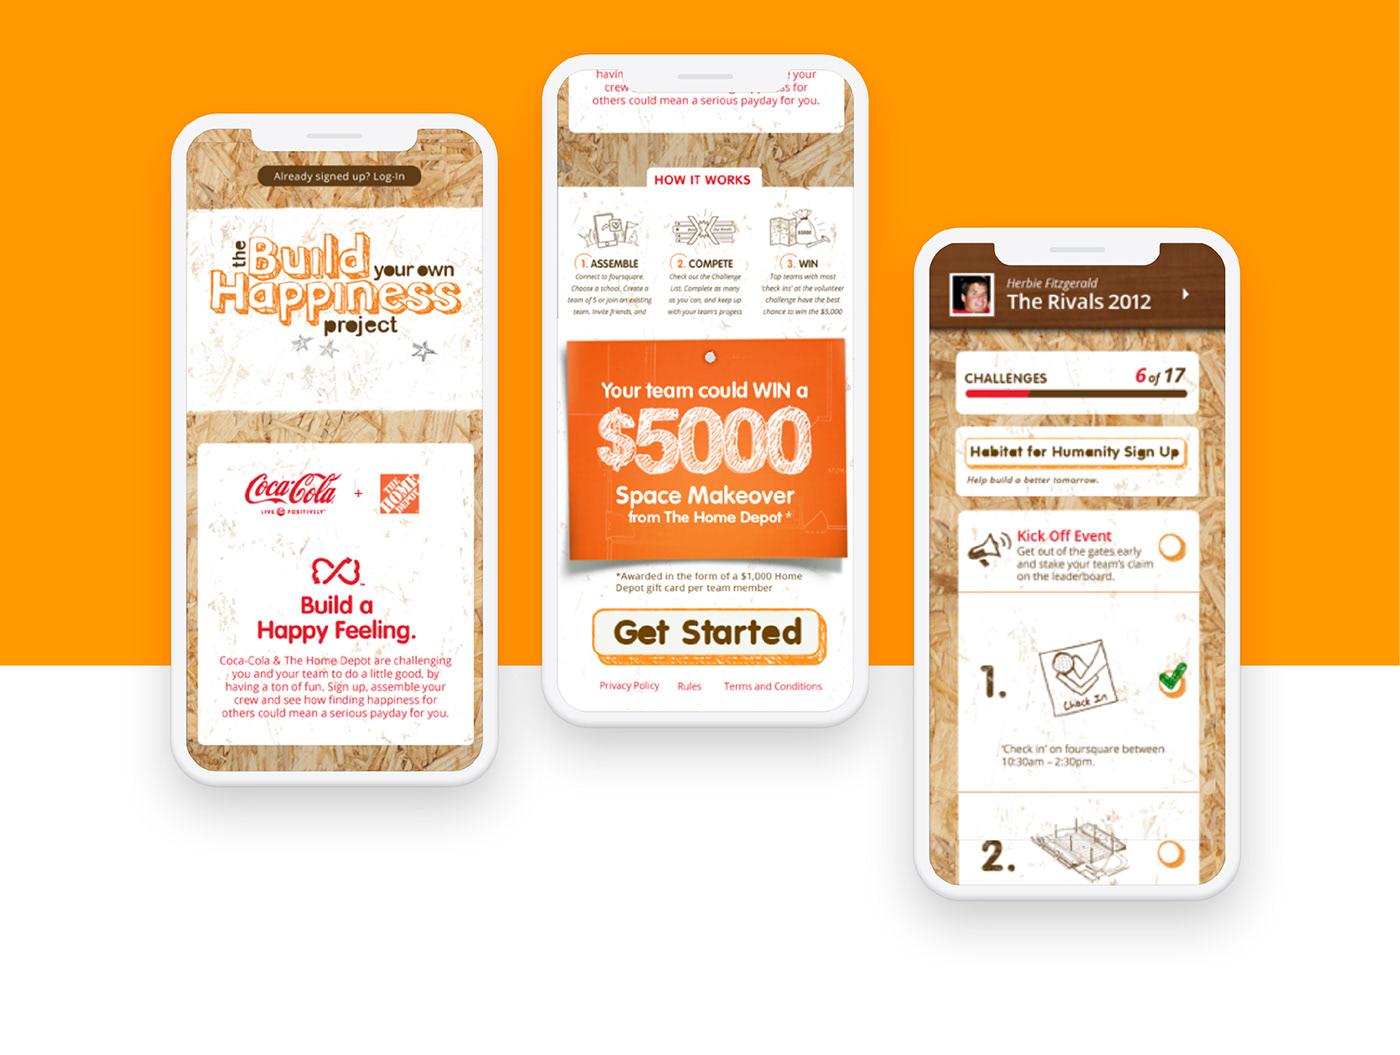 homedepot Coca-Cola interactive mobile social media foursquare Experiential local Responsive